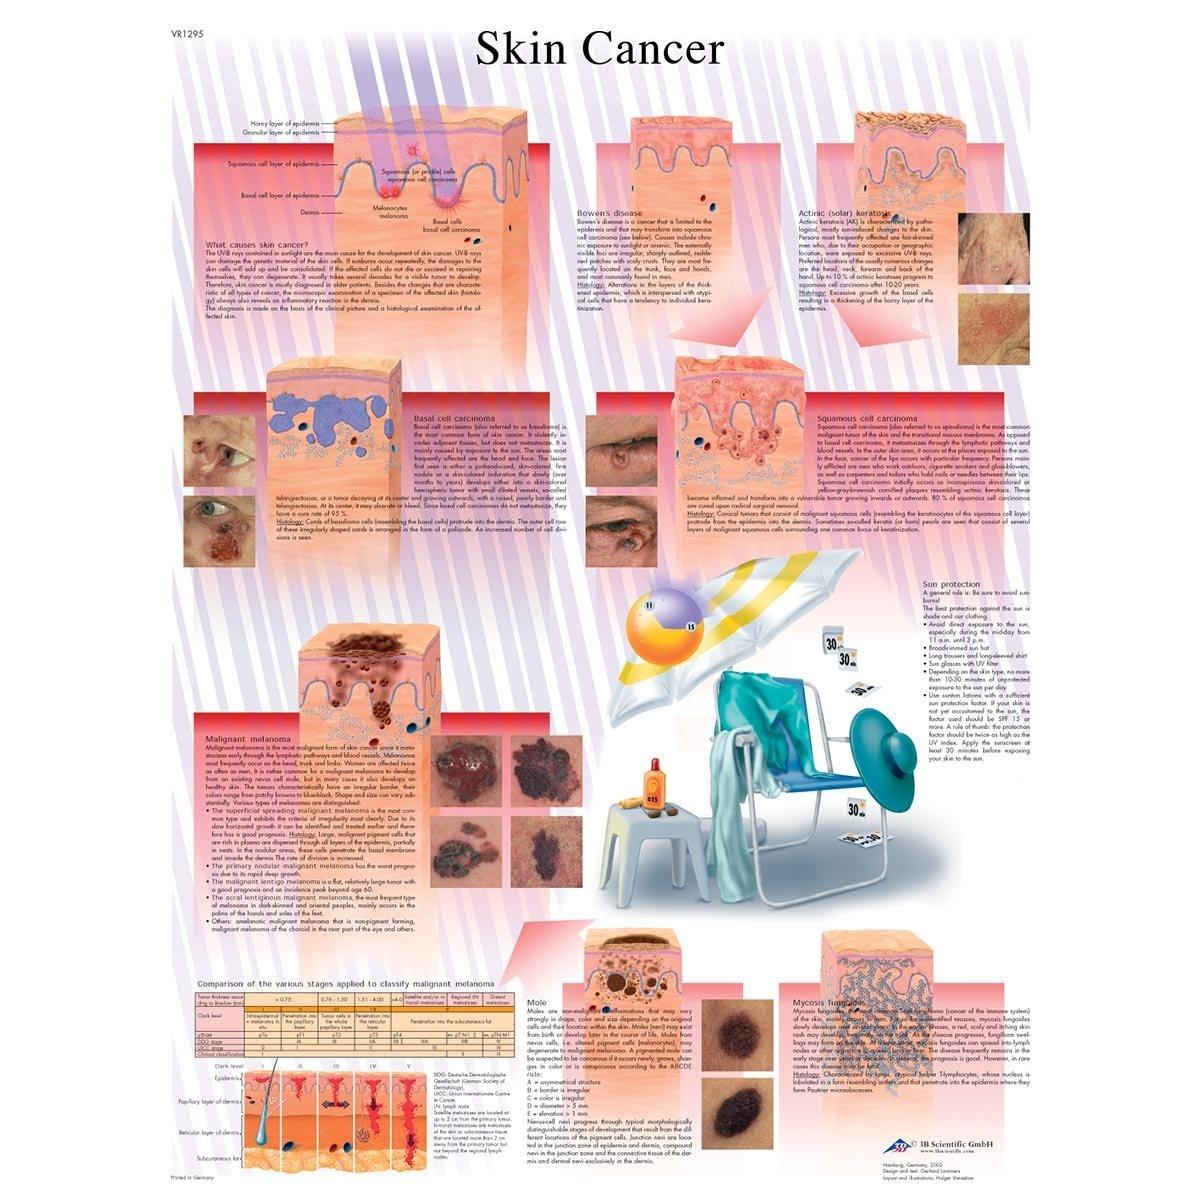 3b Scientific Skin Cancer Chart